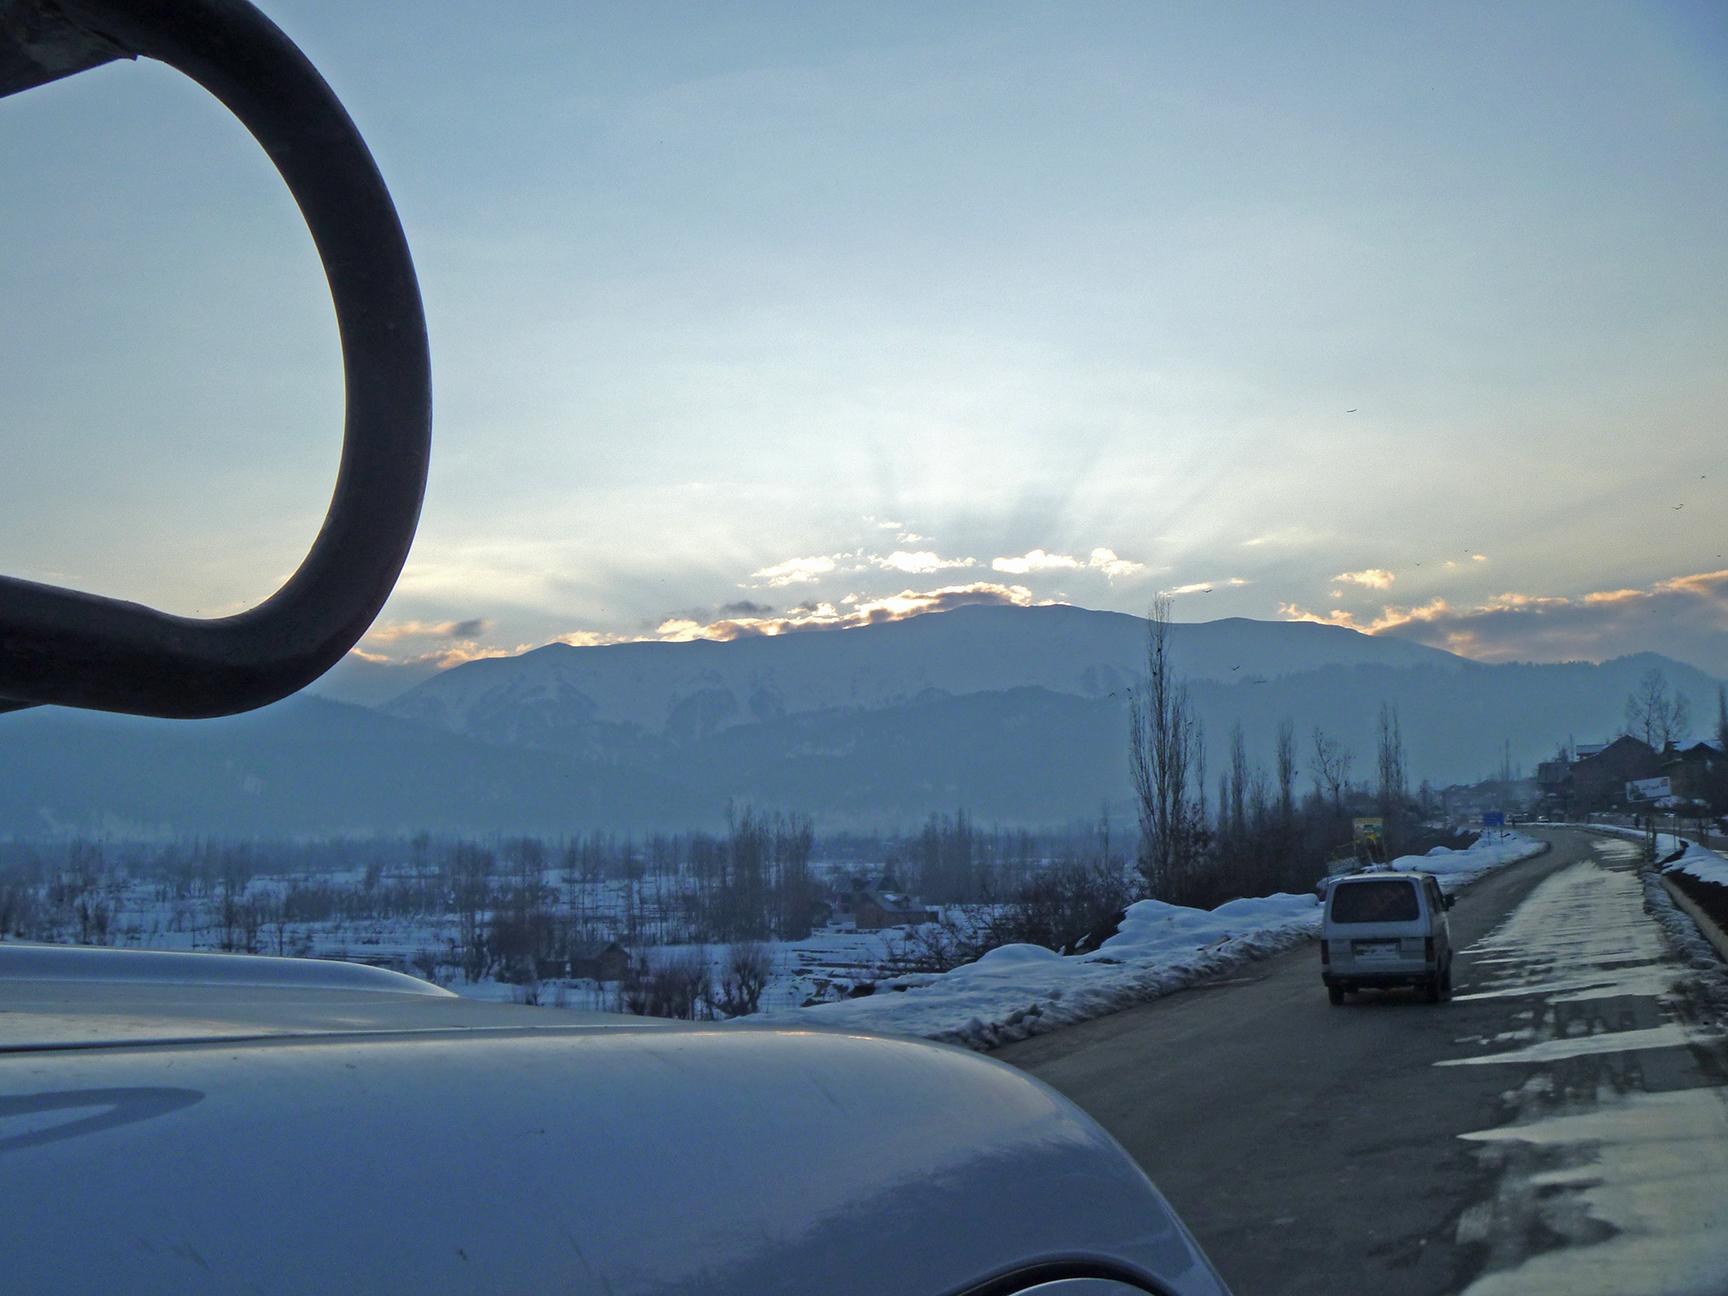 Mighty Mt. Affarwat at sunset from the Srinagar-Gulmarg road